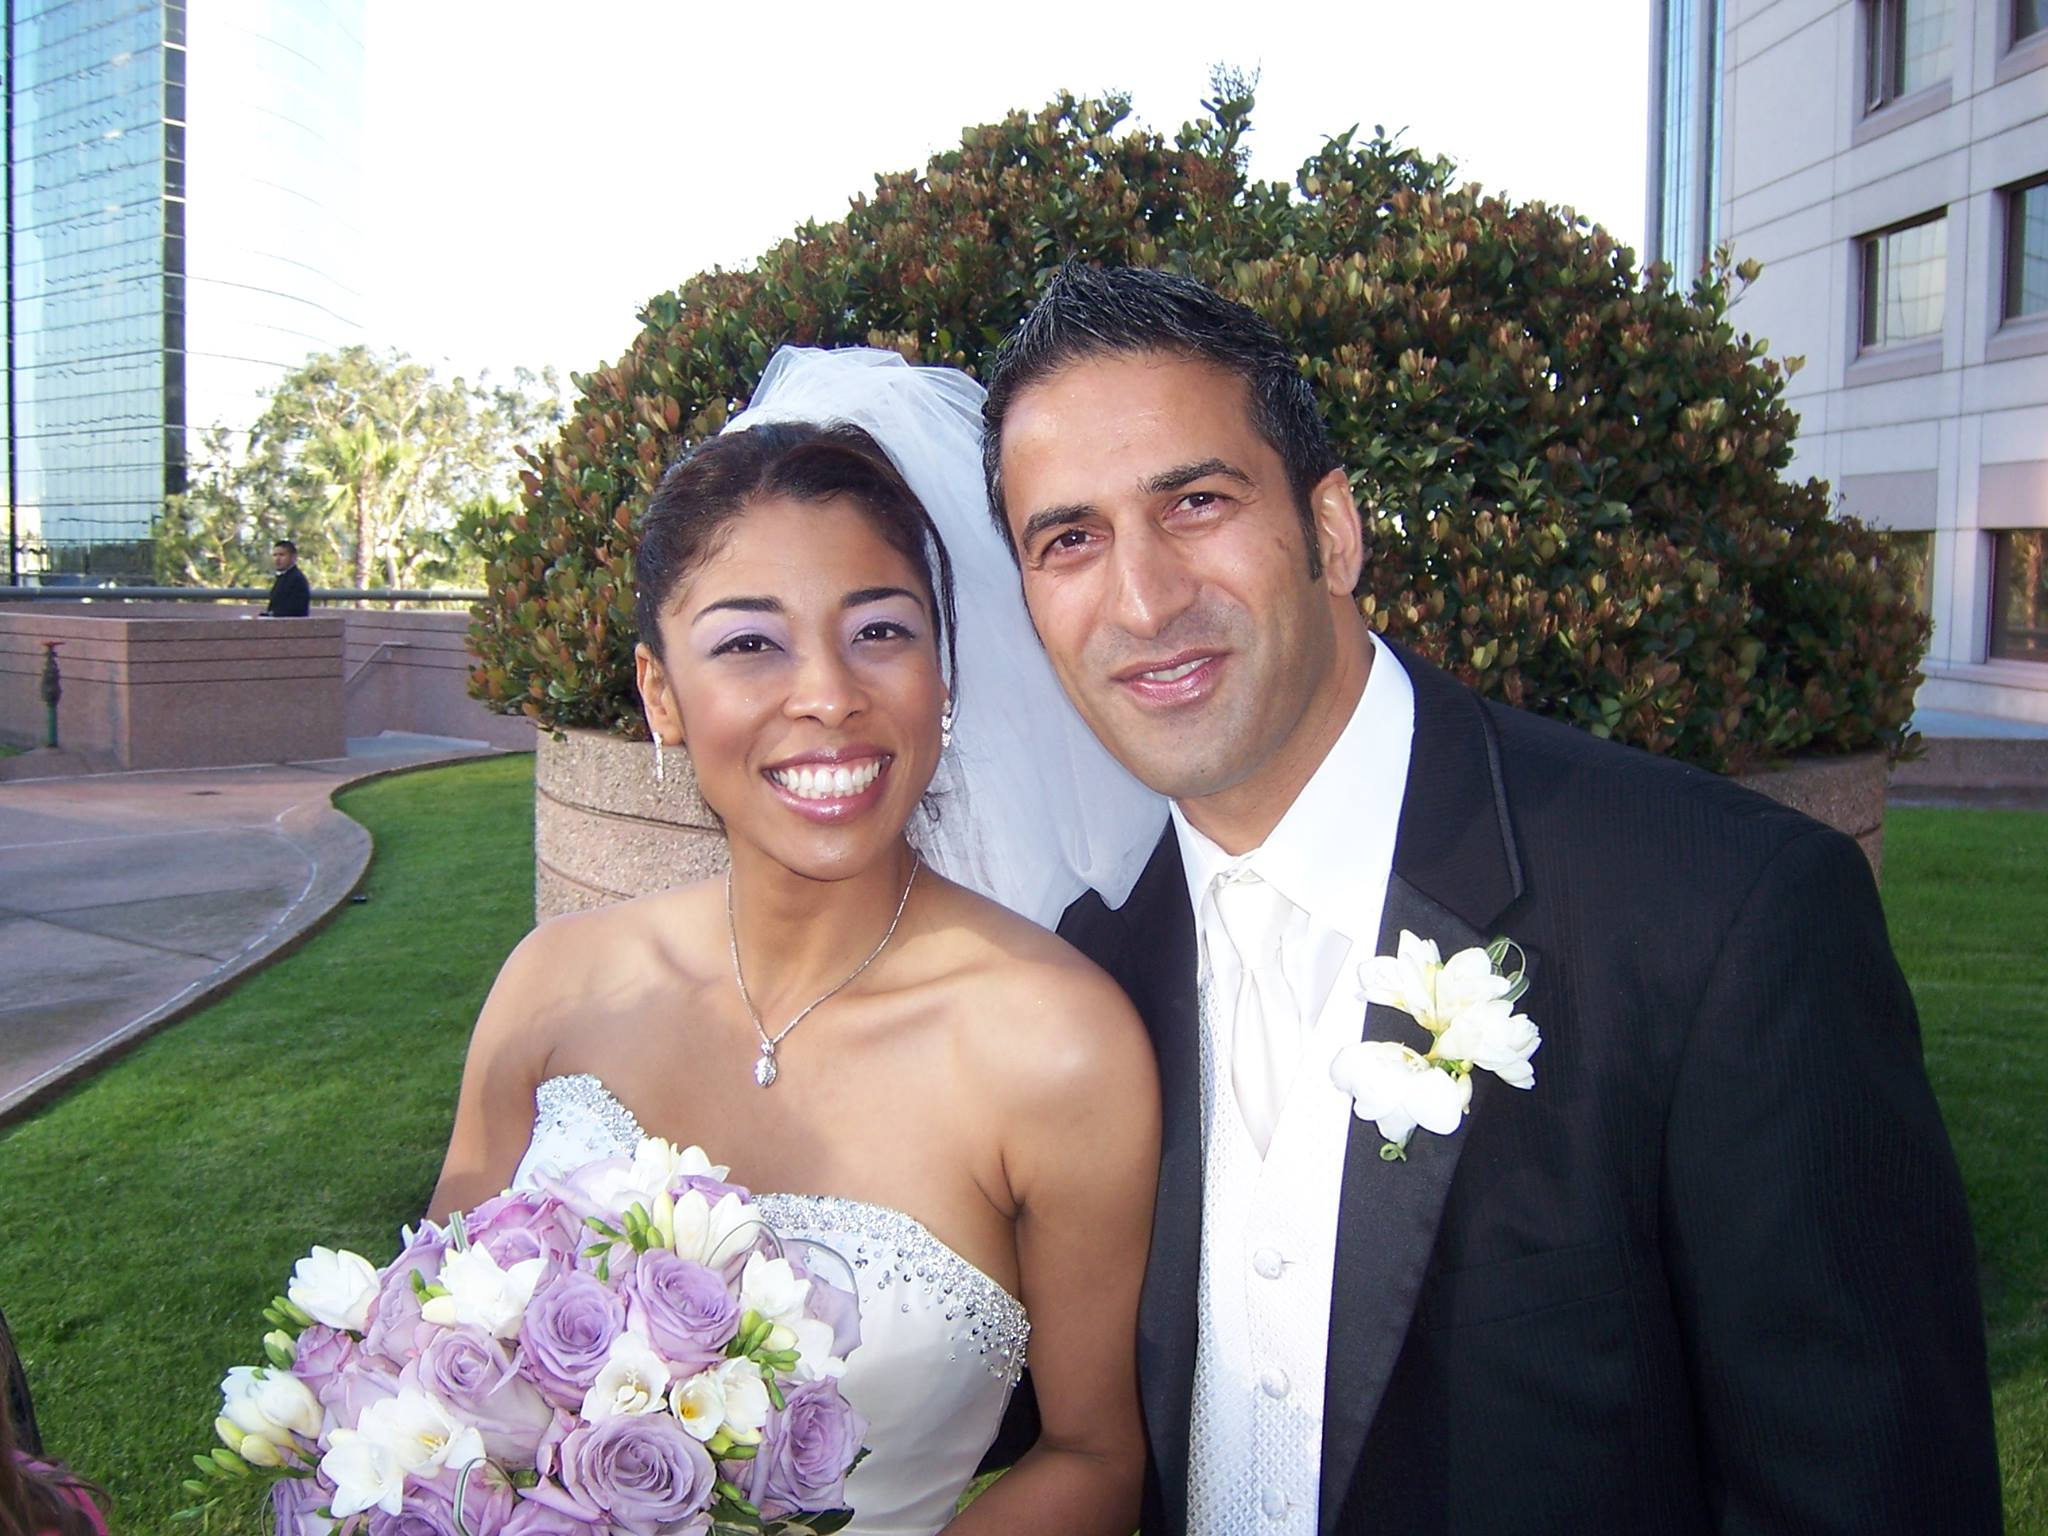 happy-couple-apricale-italy.jpg